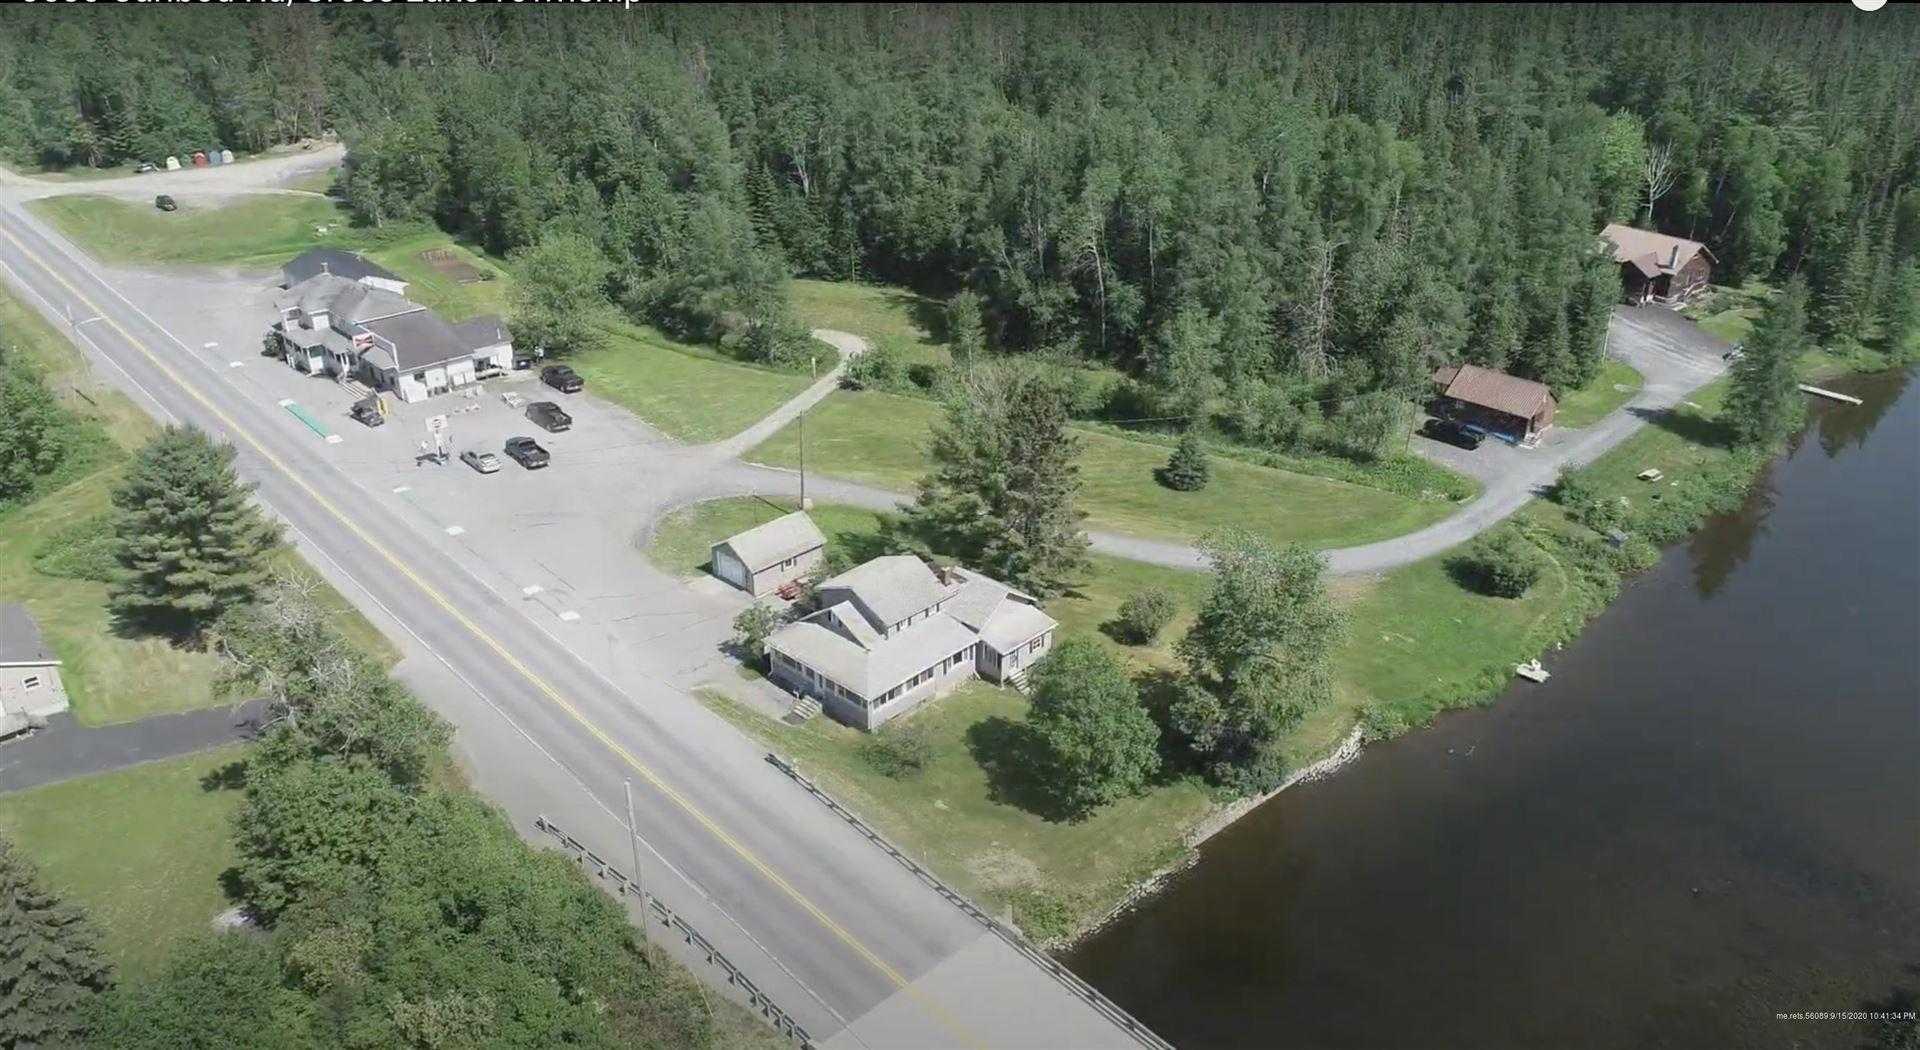 Photo of 3580 Caribou Road, Cross Lake Township, ME 04779 (MLS # 1457334)